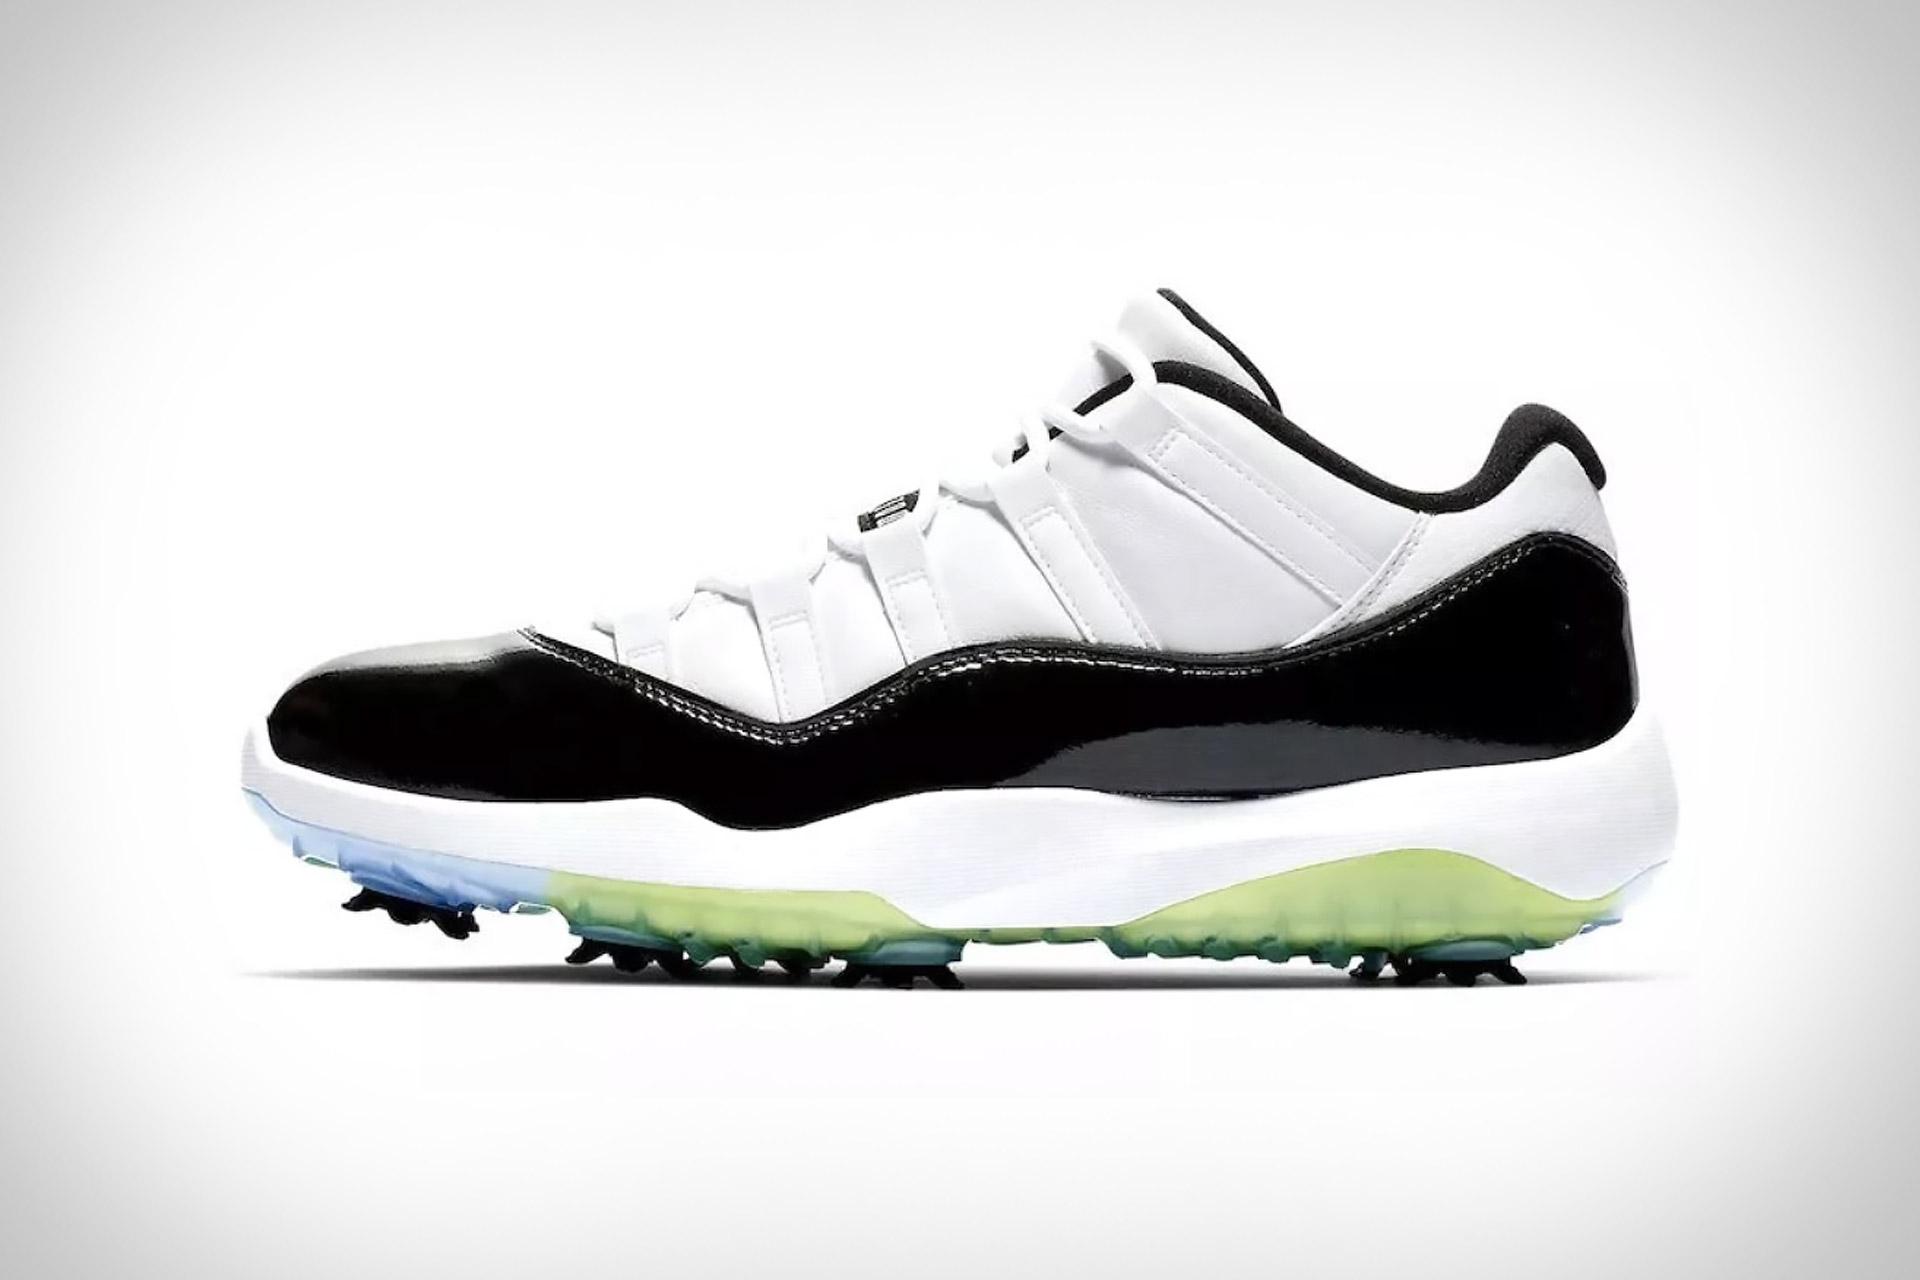 sports shoes c1034 8ade4 Air Jordan XI Golf Shoe